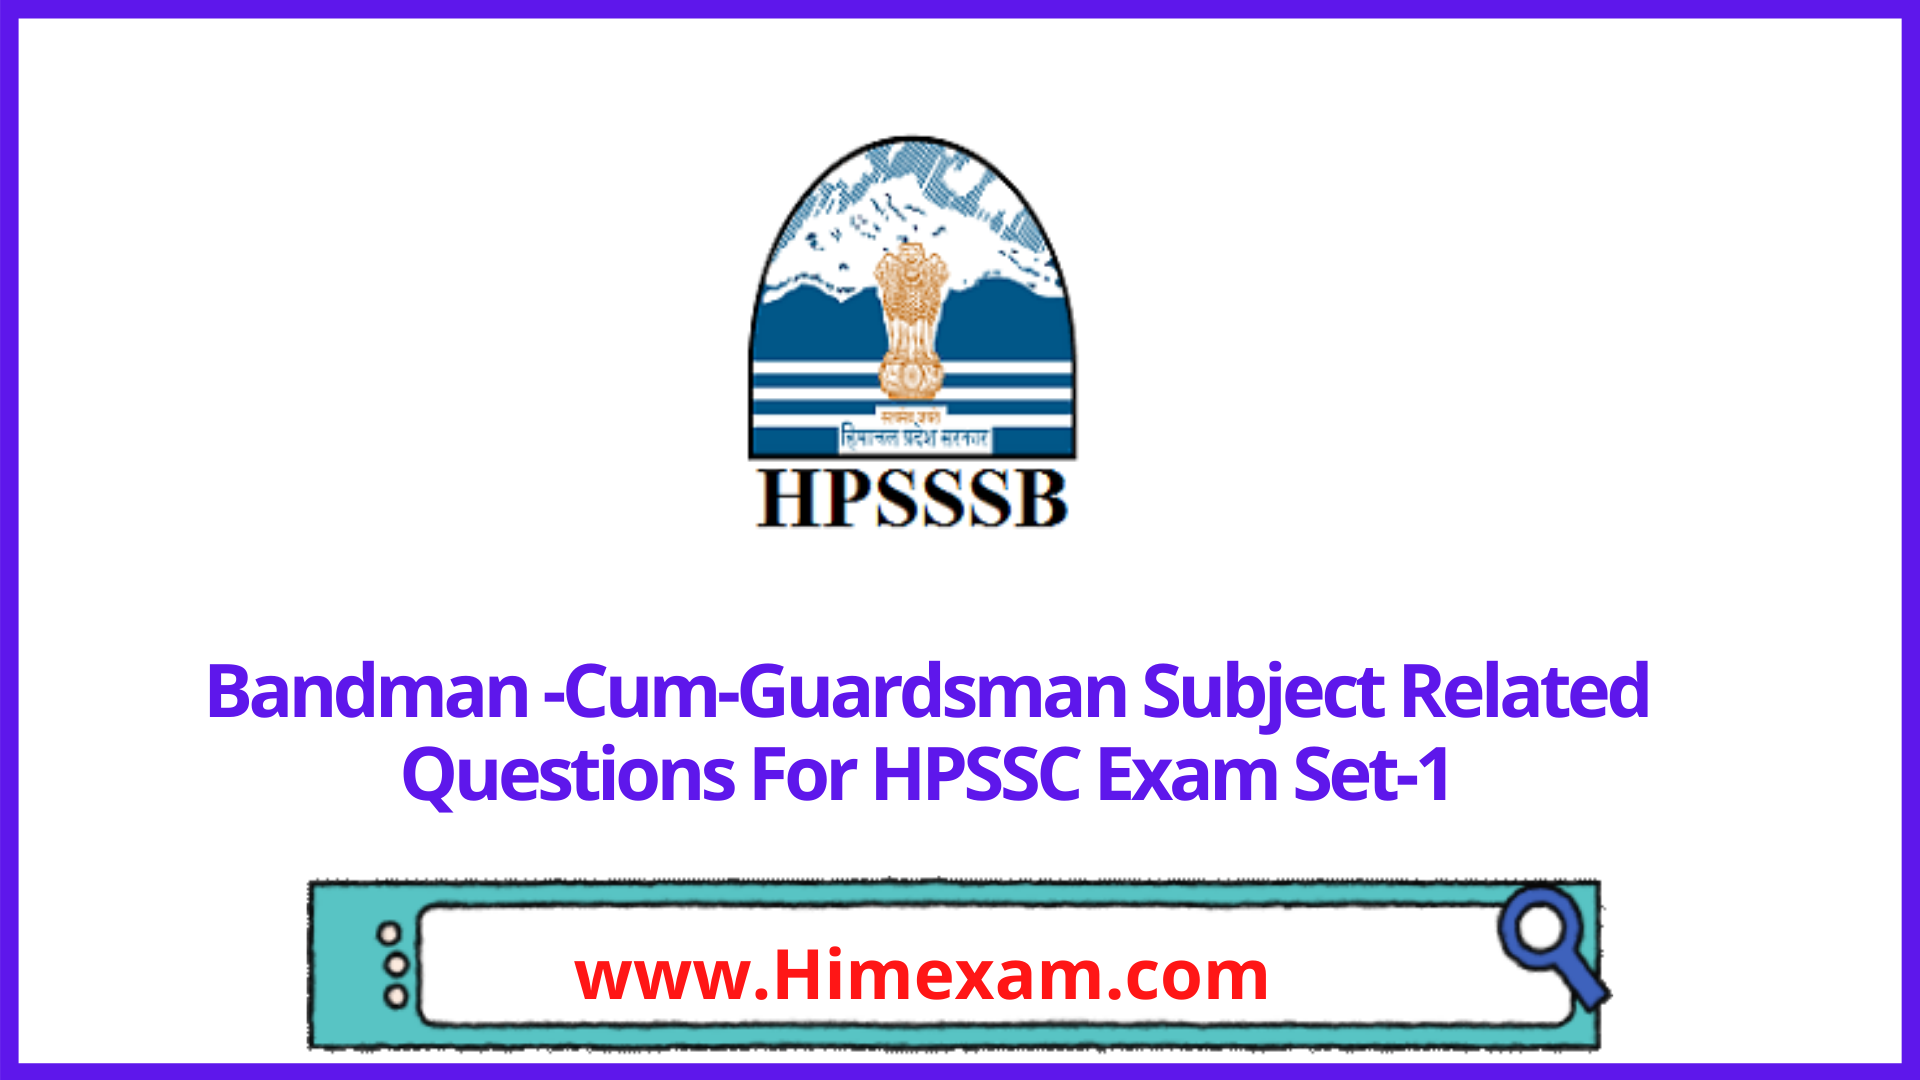 Bandman -Cum-Guardsman Subject Related Questions For HPSSC Exam Set-1